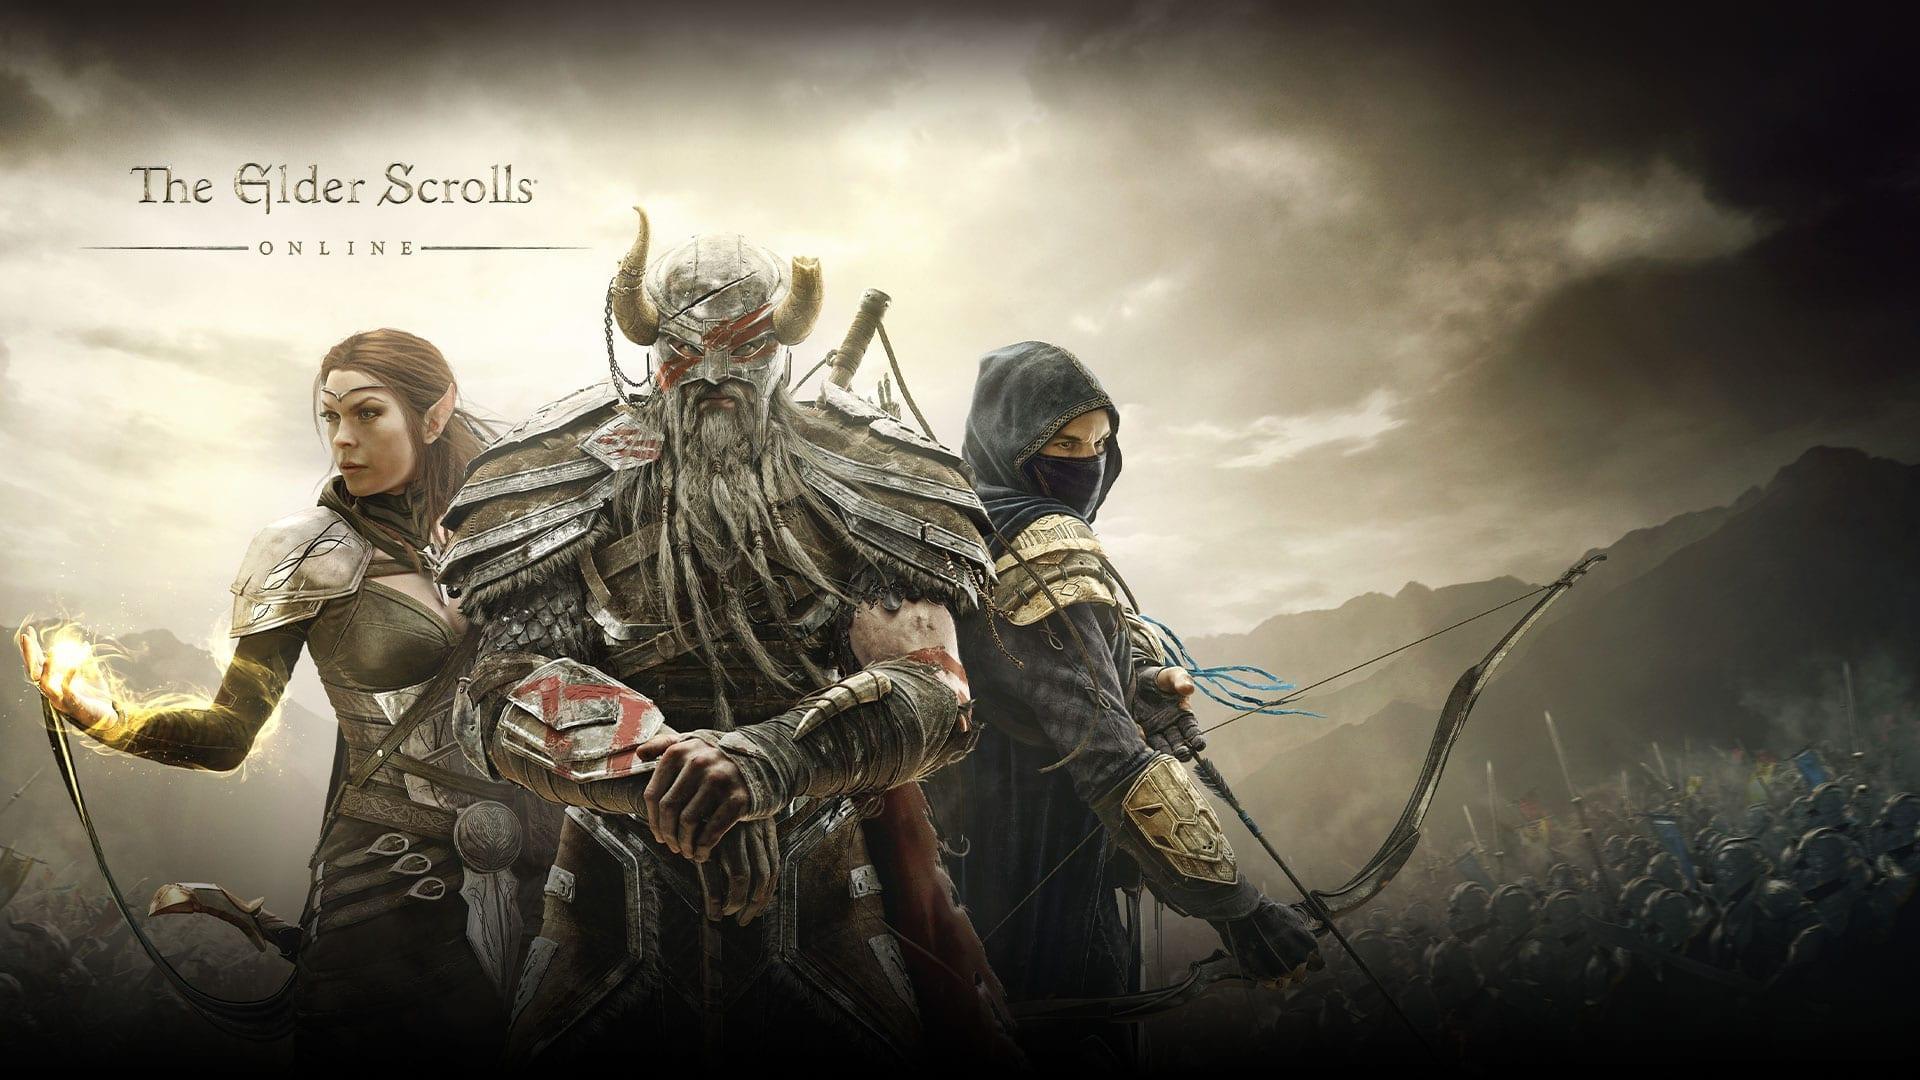 Elder Scrolls Online Devs Are Working On An Unannounced IP